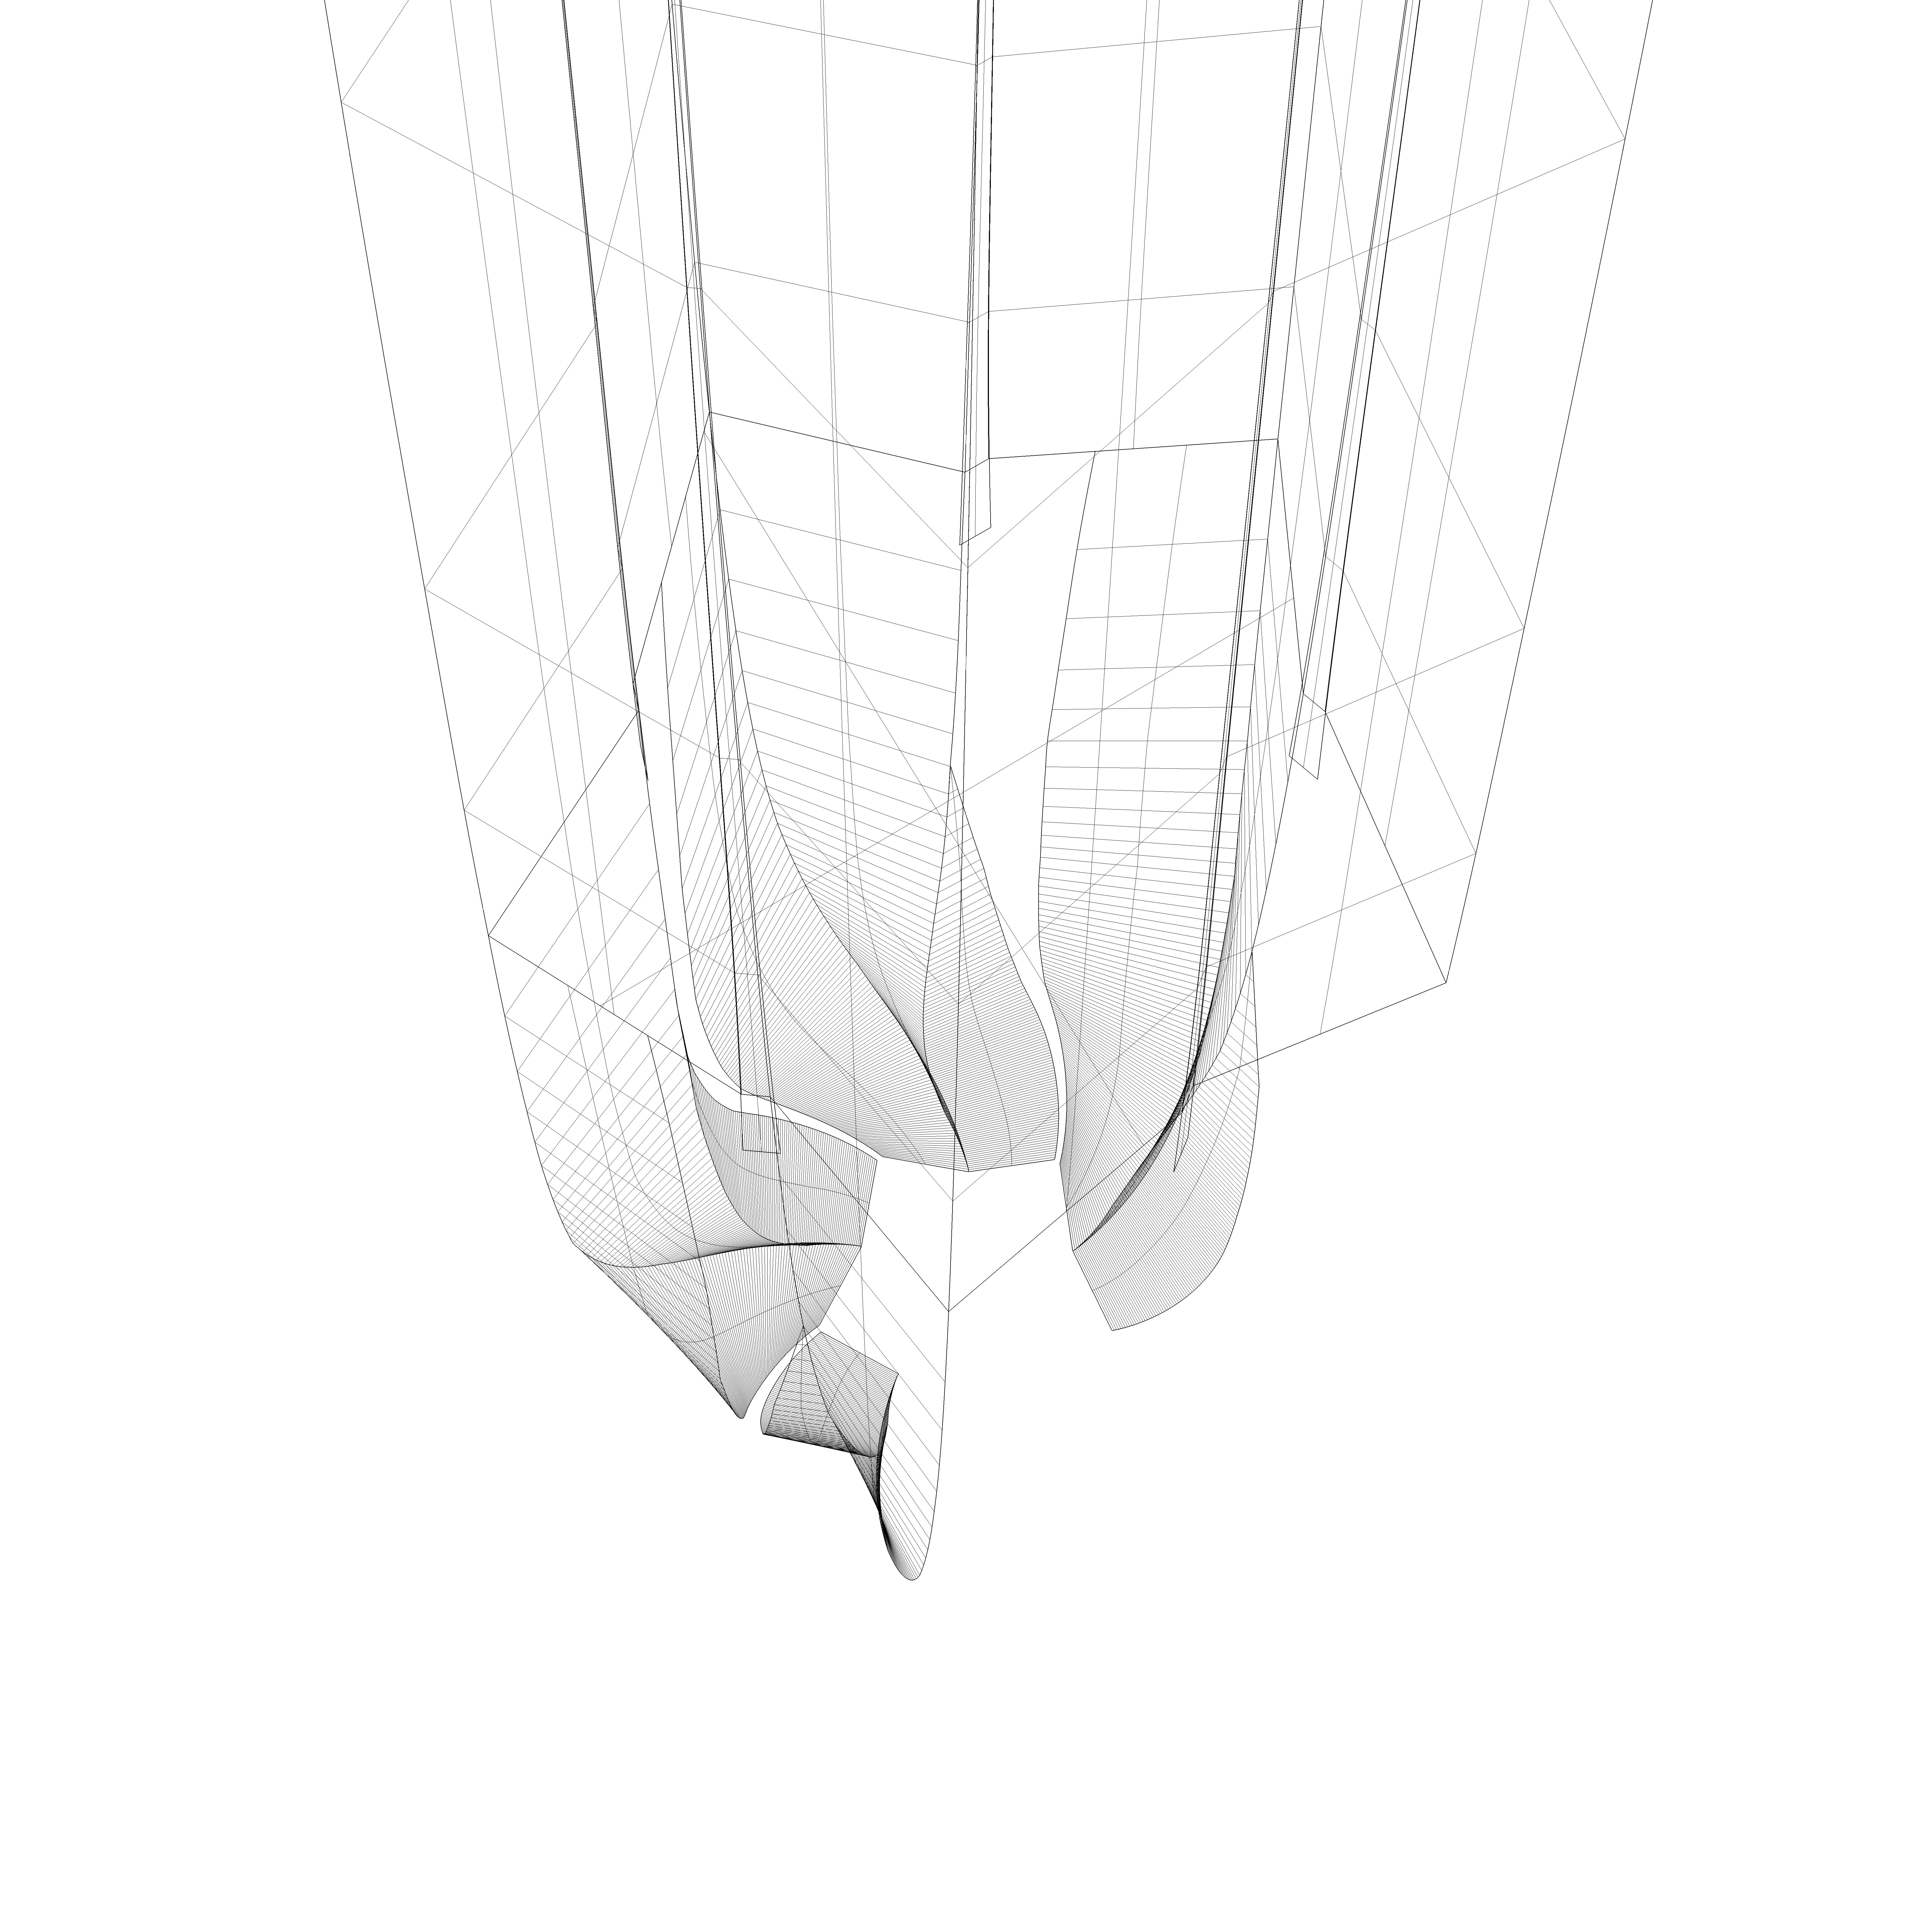 Модель оболочки Башни Лахта Центра